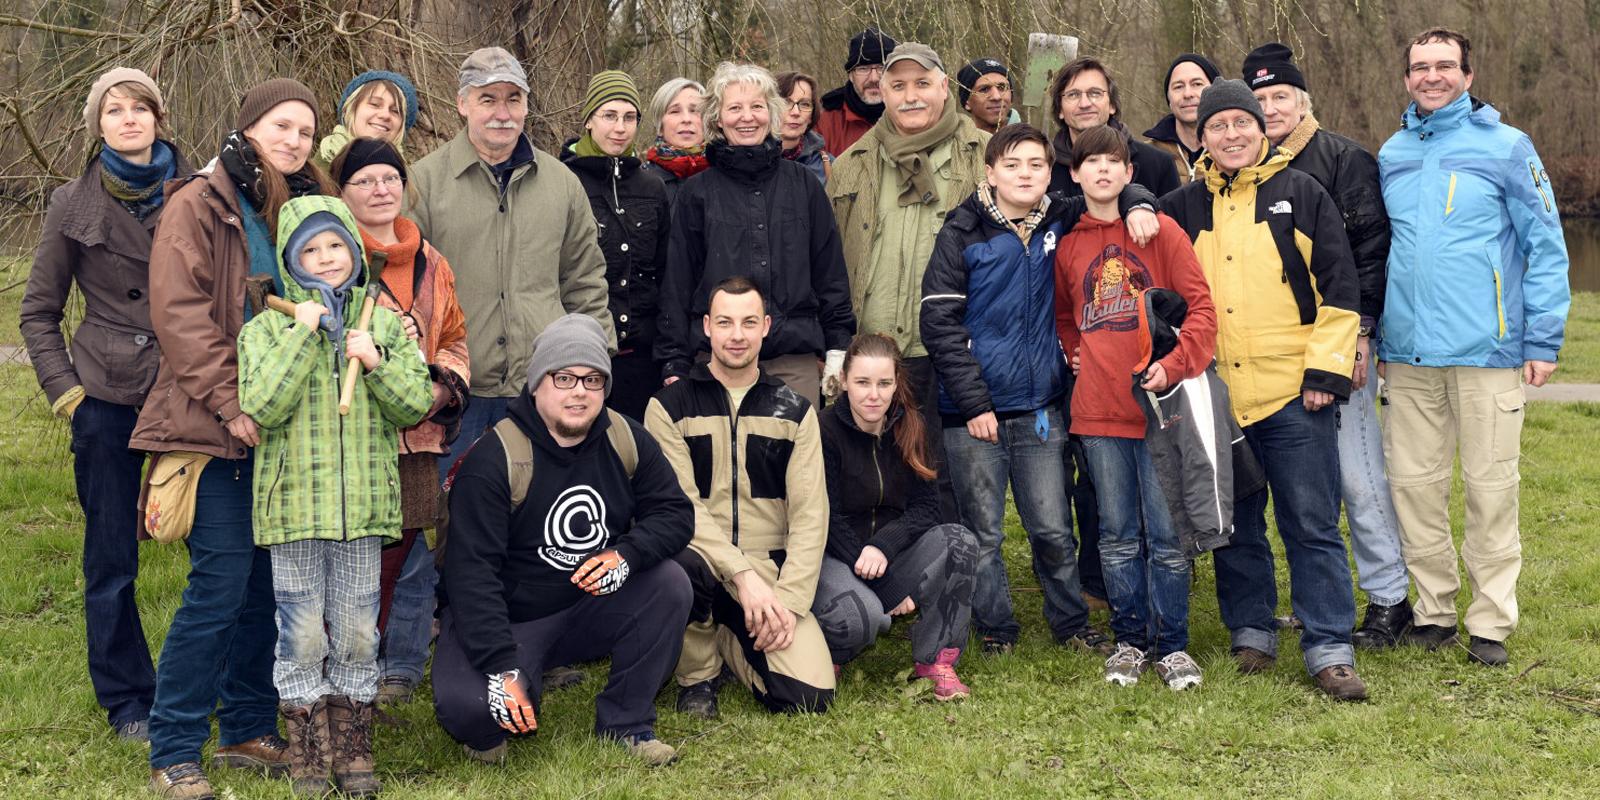 "TeilnehmerInnen an der Aktion ""Bäume pflanzen, statt""abholzen"" am 25. März 2016"